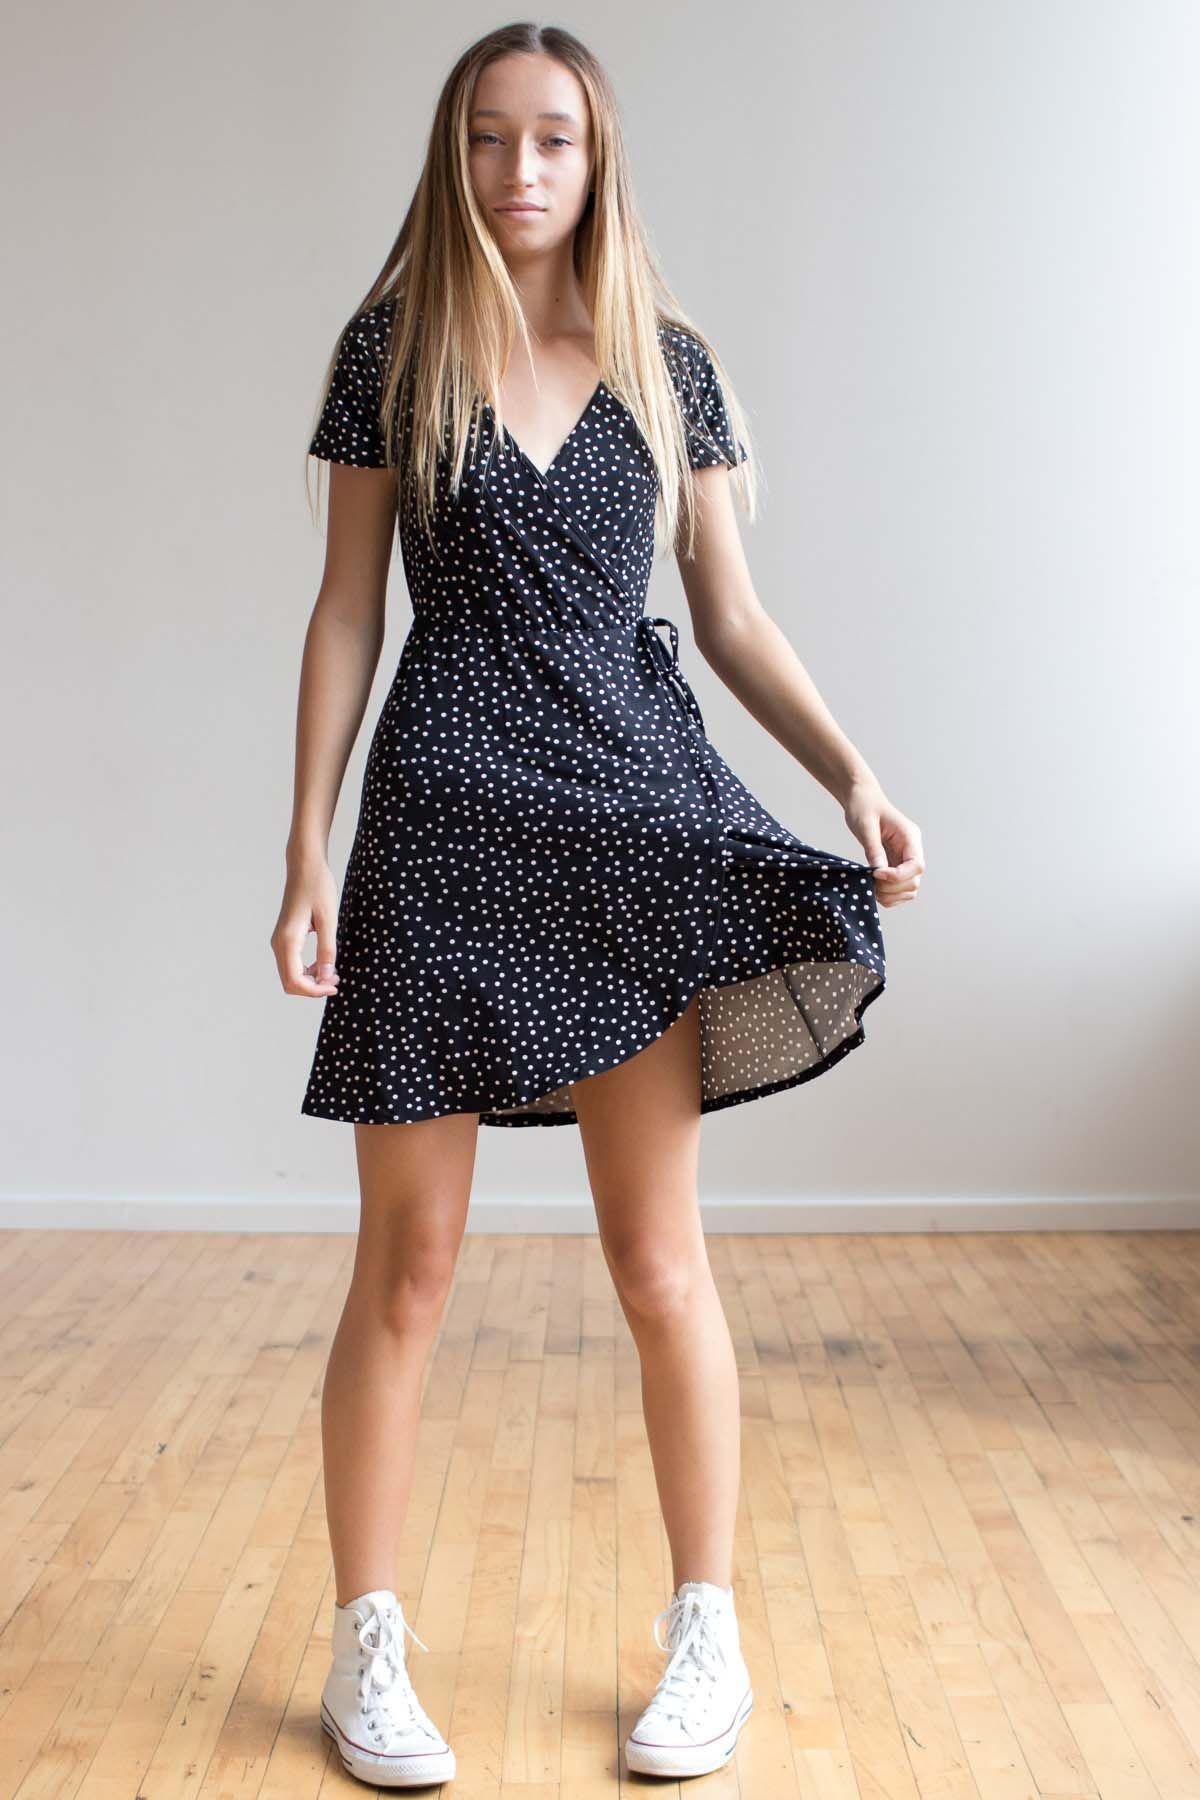 Polka Dot Wrap Dress Ragstock Summer Dress Outfits Casual Dresses Casual Dresses For Women [ 1800 x 1200 Pixel ]